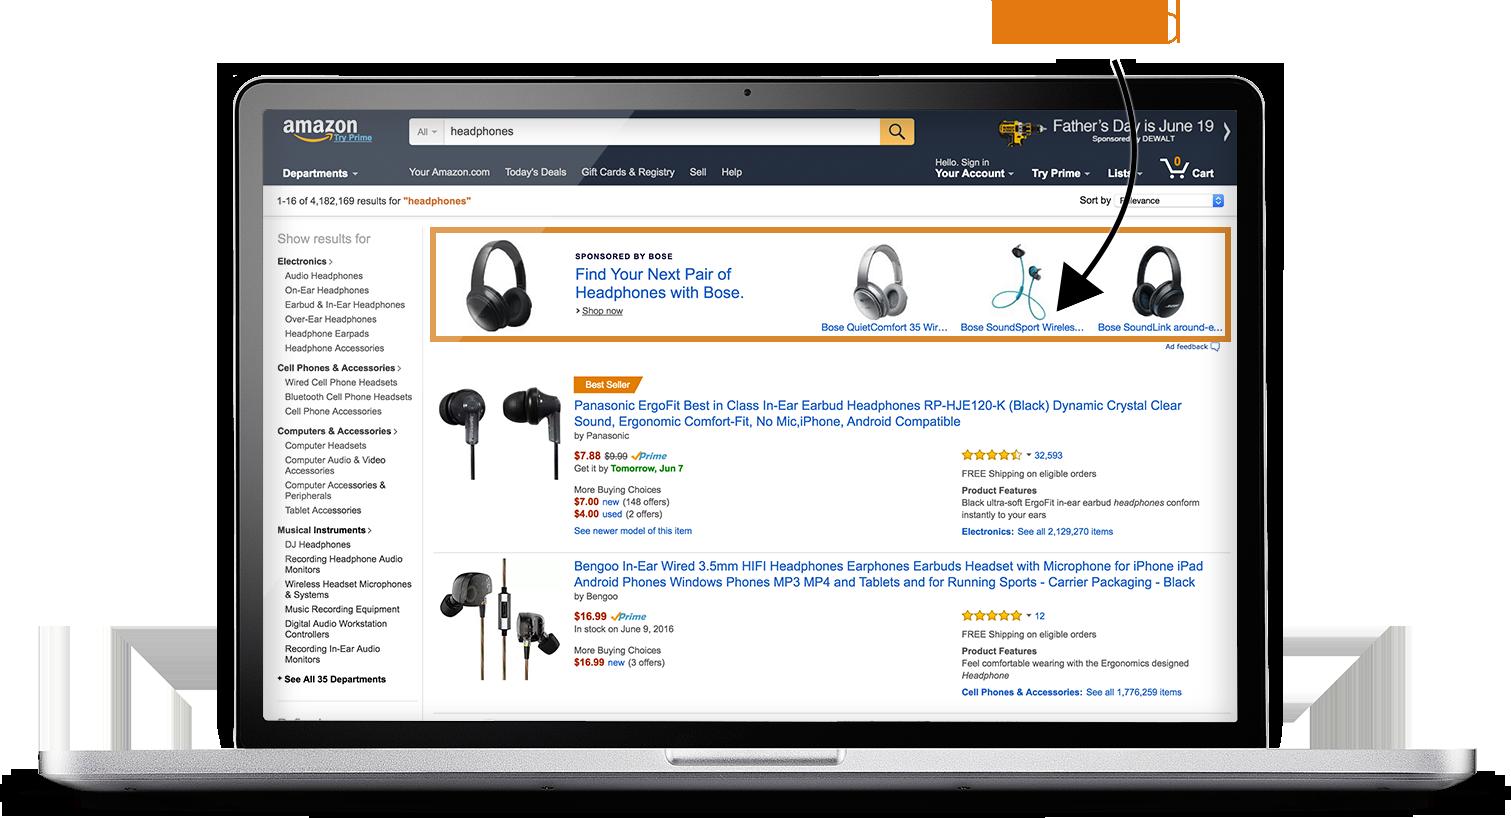 Amazon Ad.png